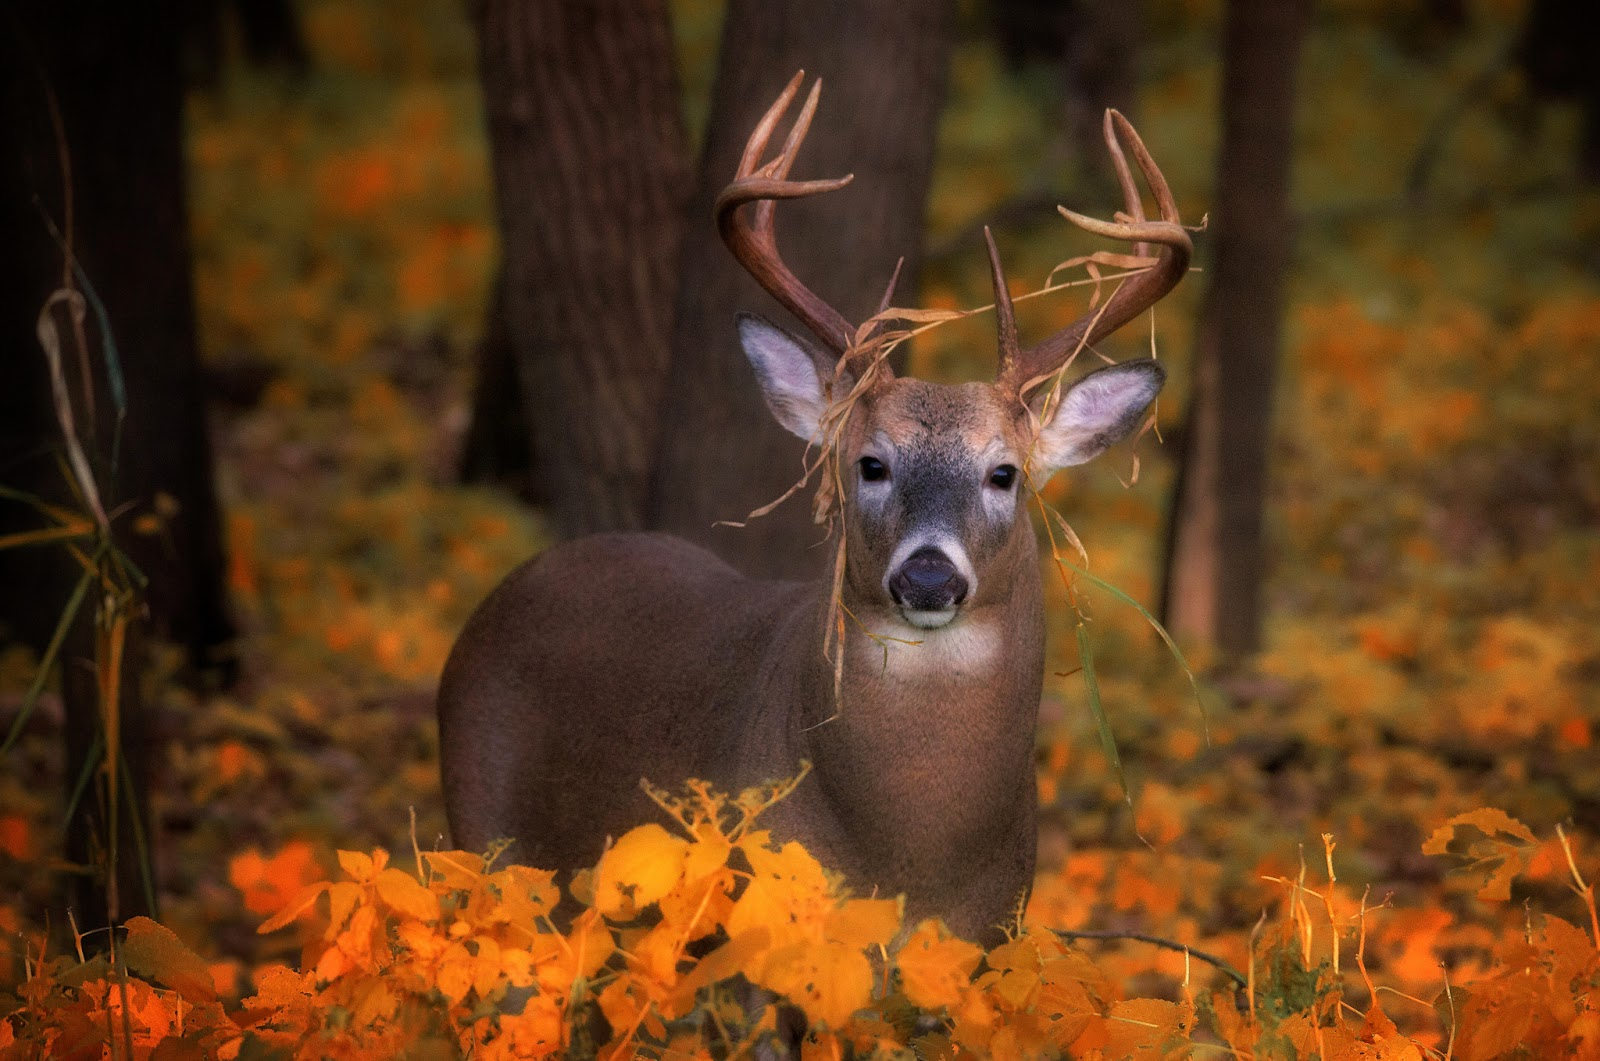 Fonds d 39 cran automne flamboyant fonds d 39 cran hd - Photo d automne gratuite ...